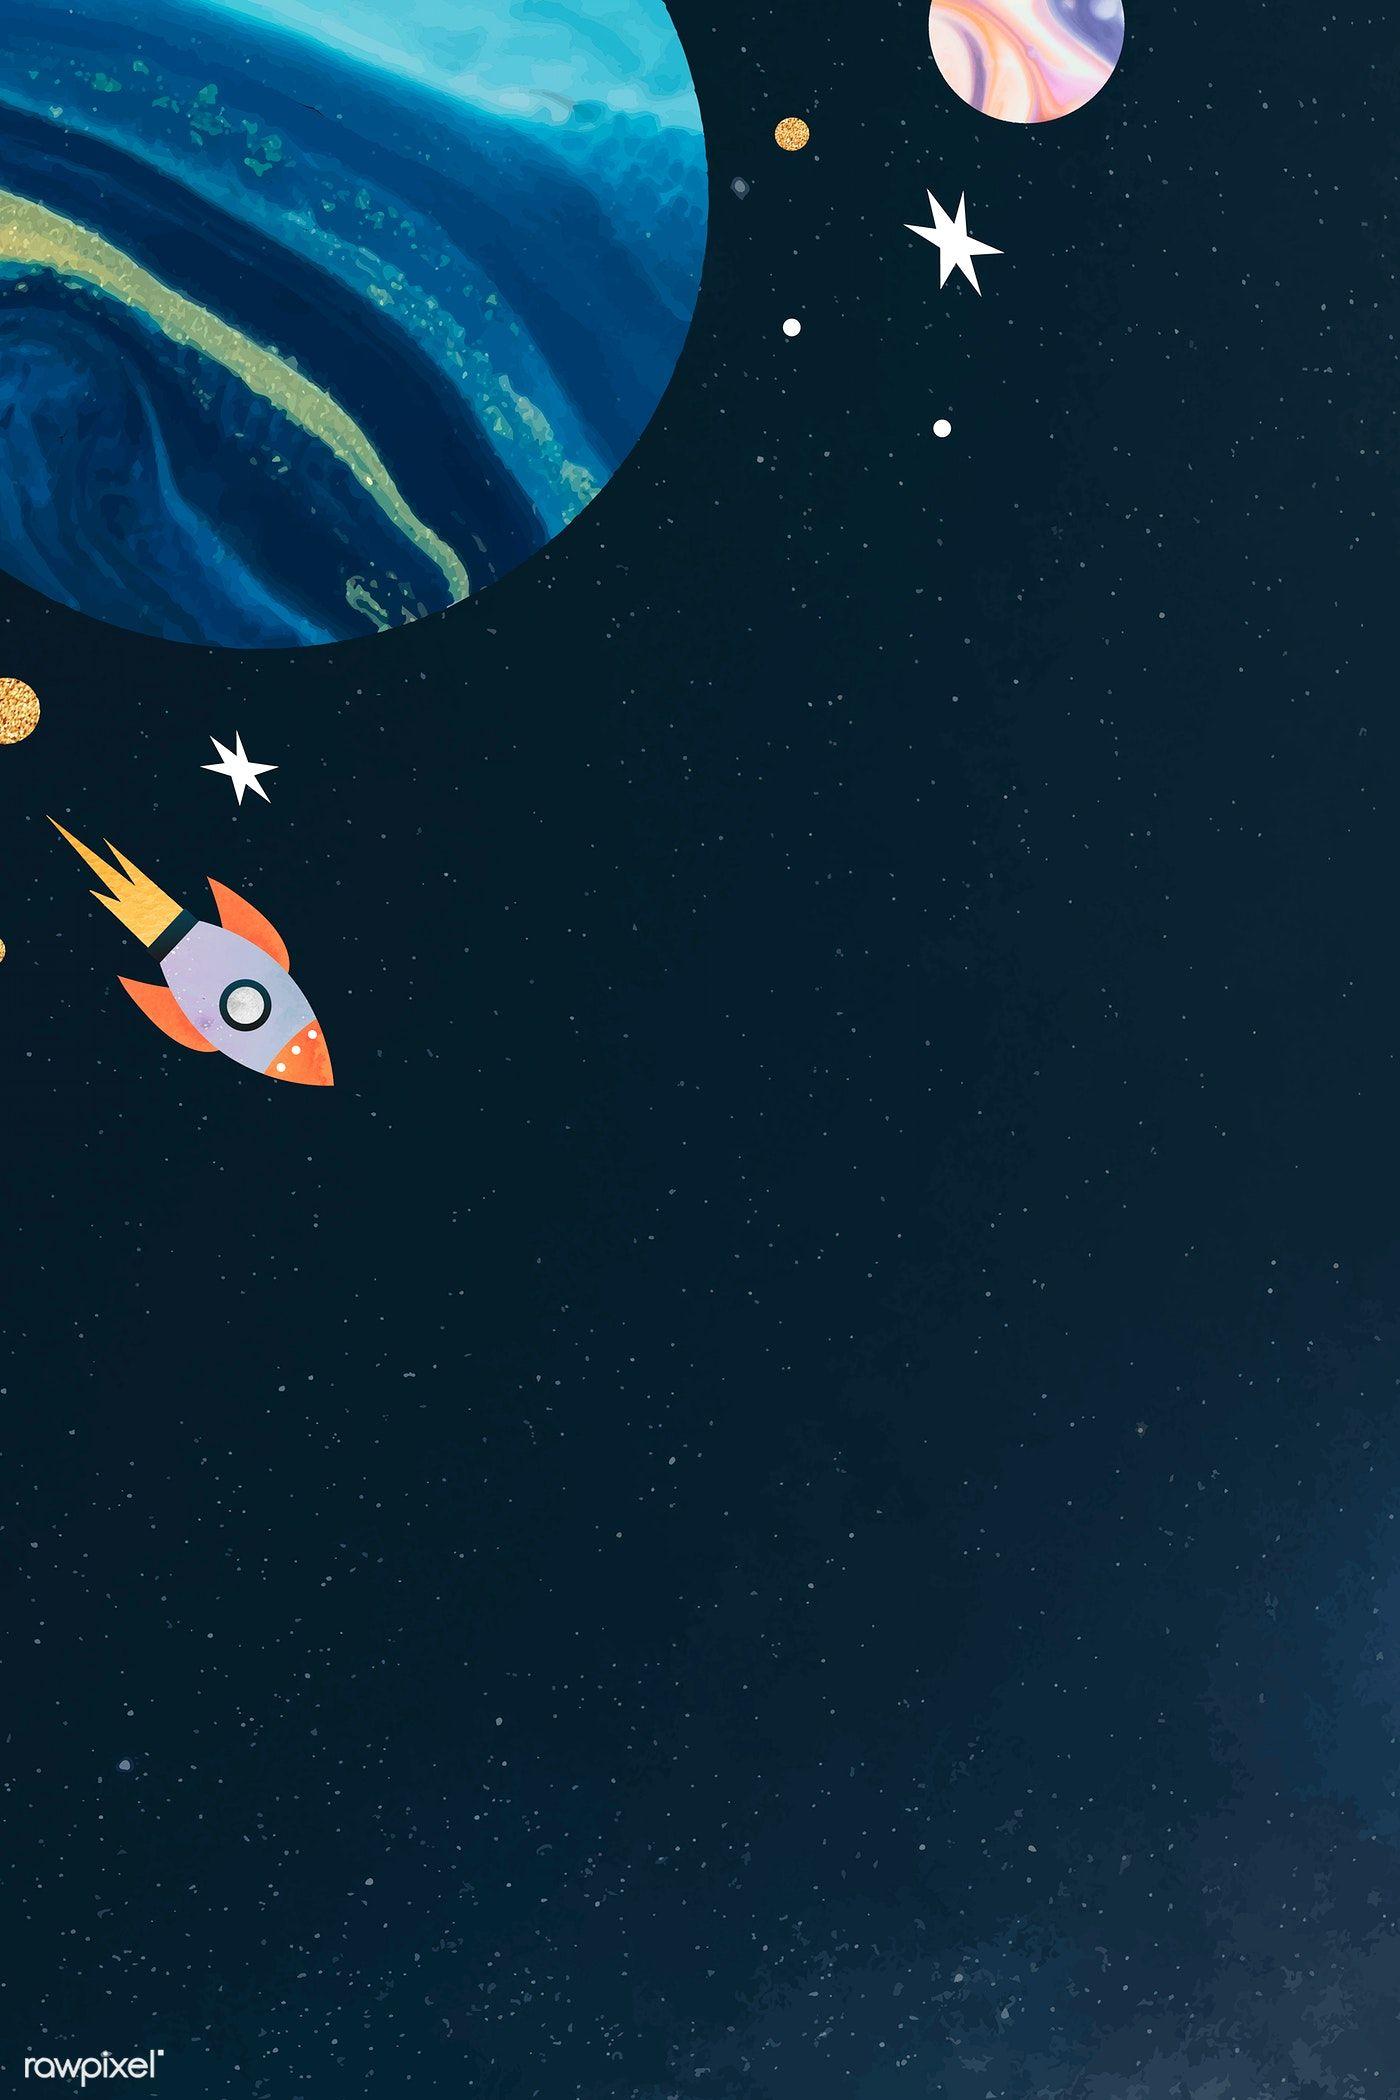 Download premium vector of Colorful galaxy waterco